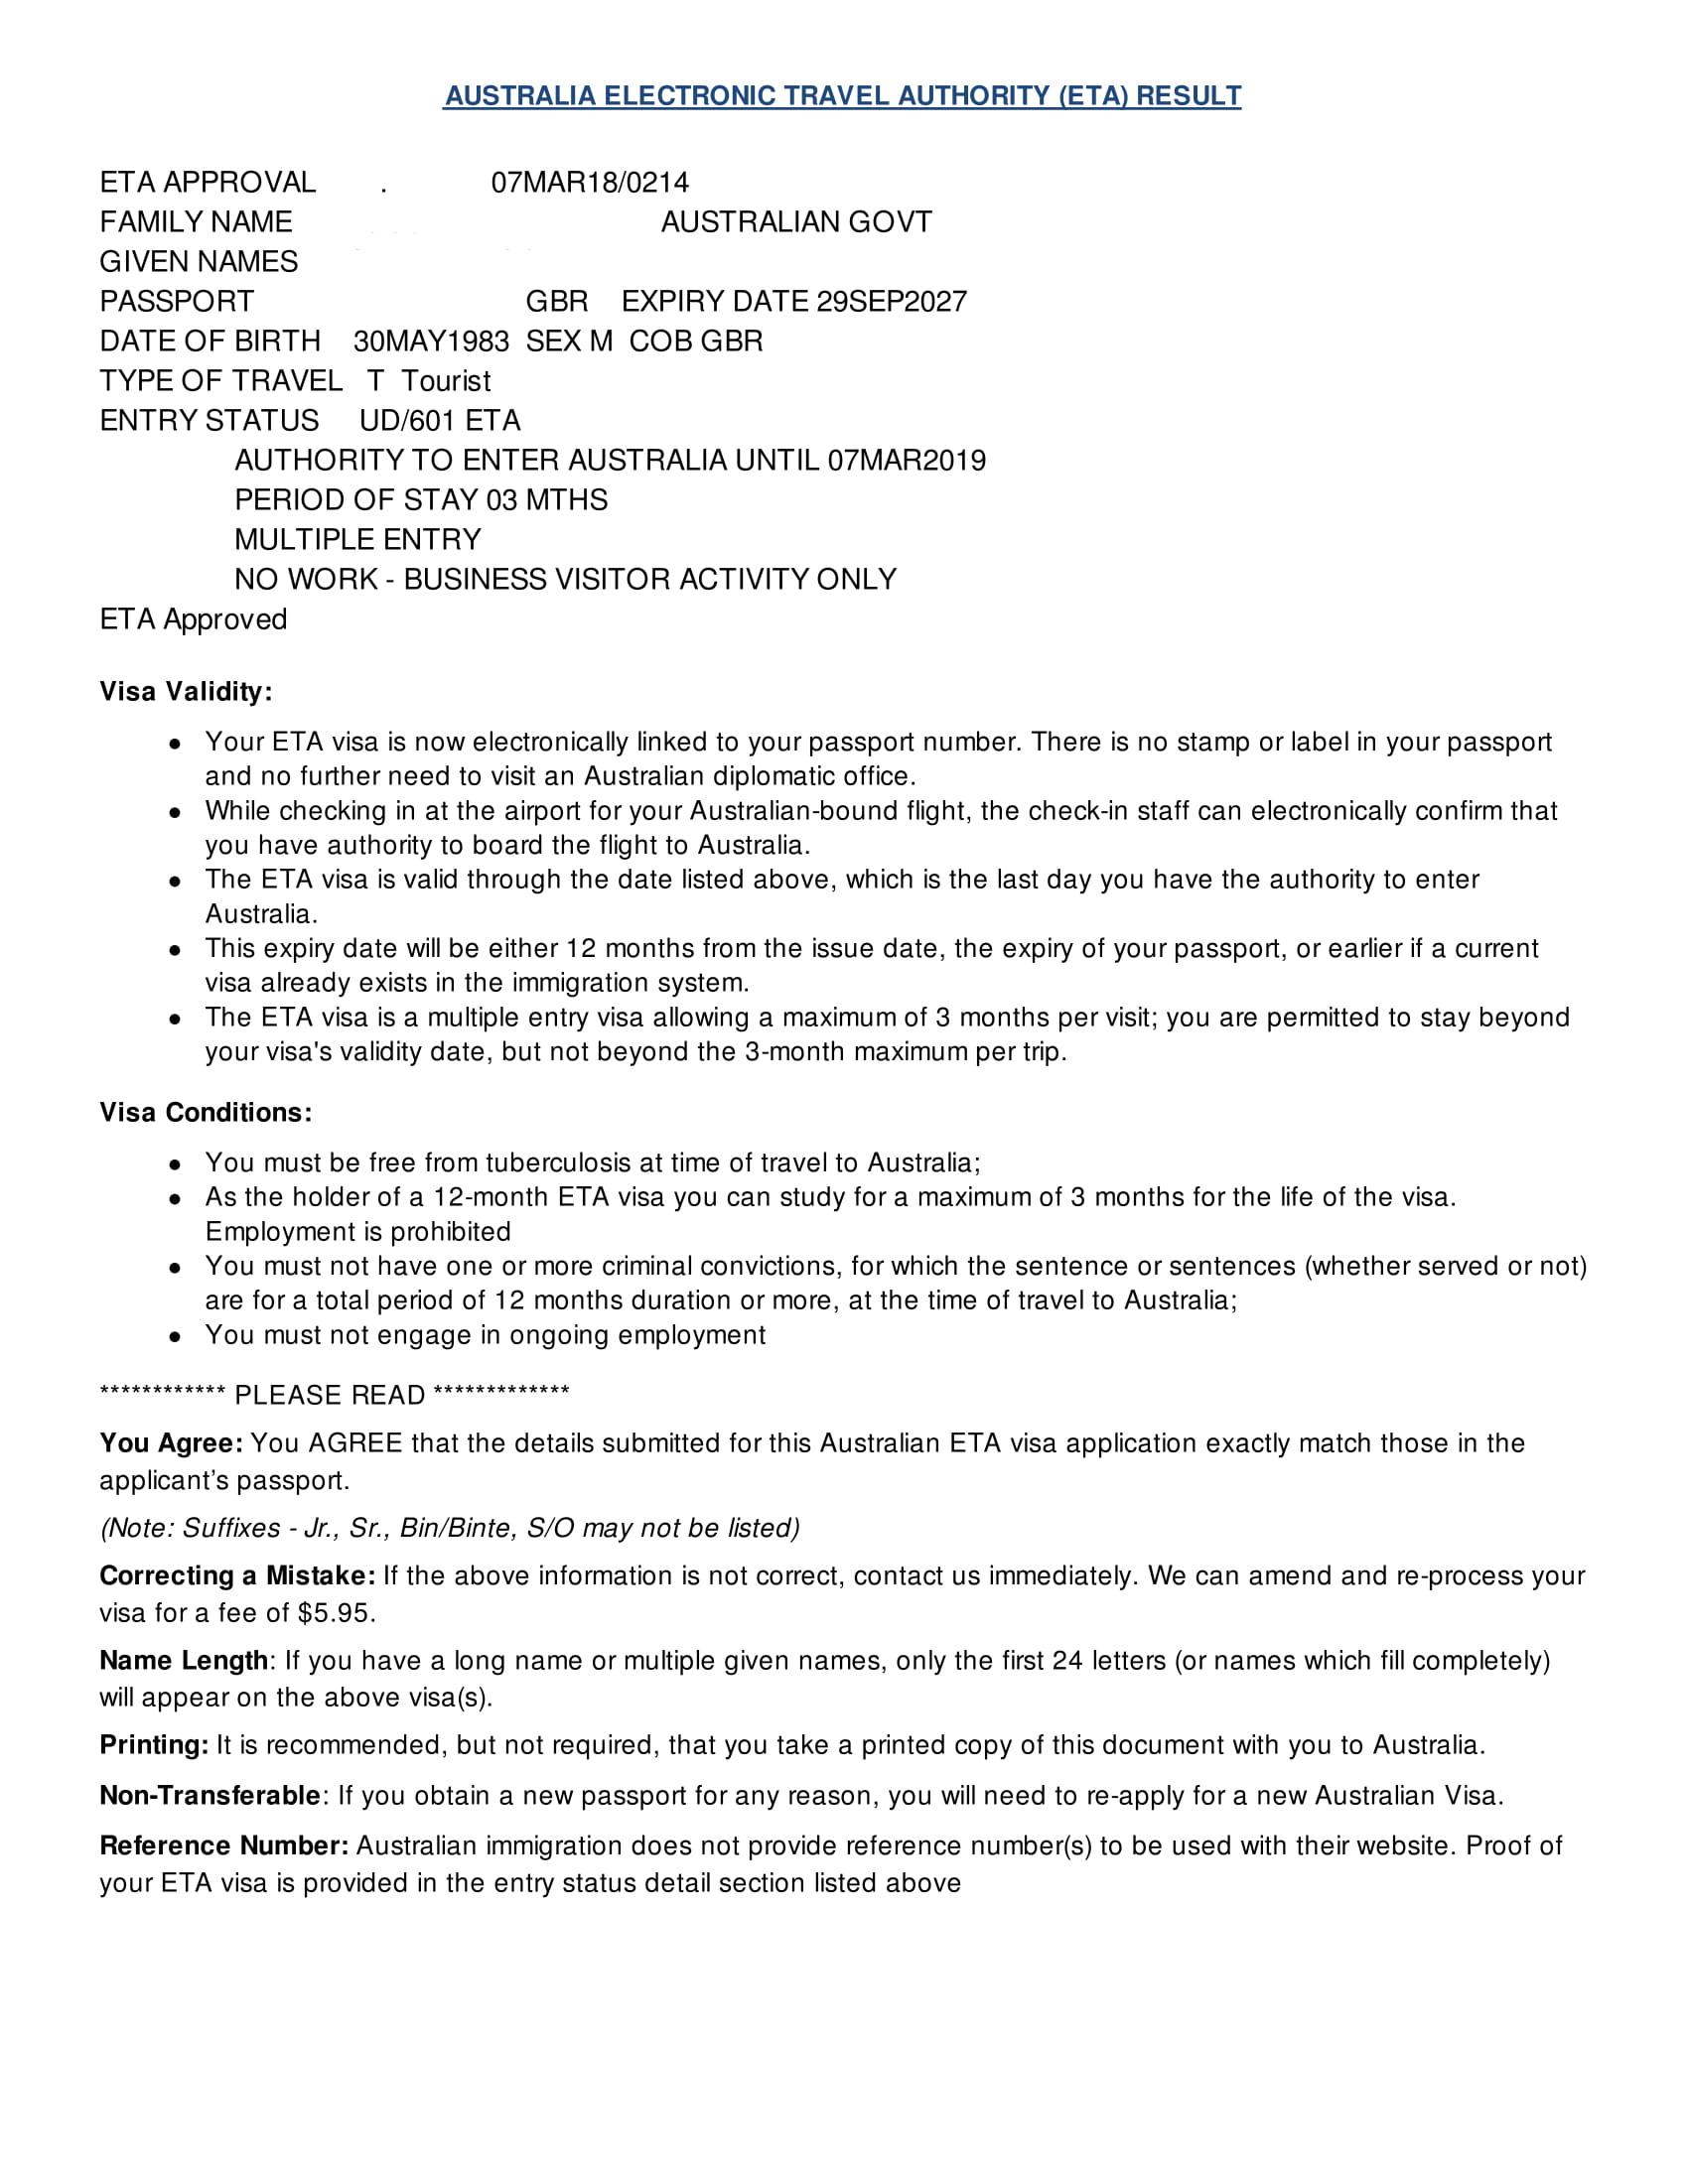 Australian Visitors Visa Application Form Fiji